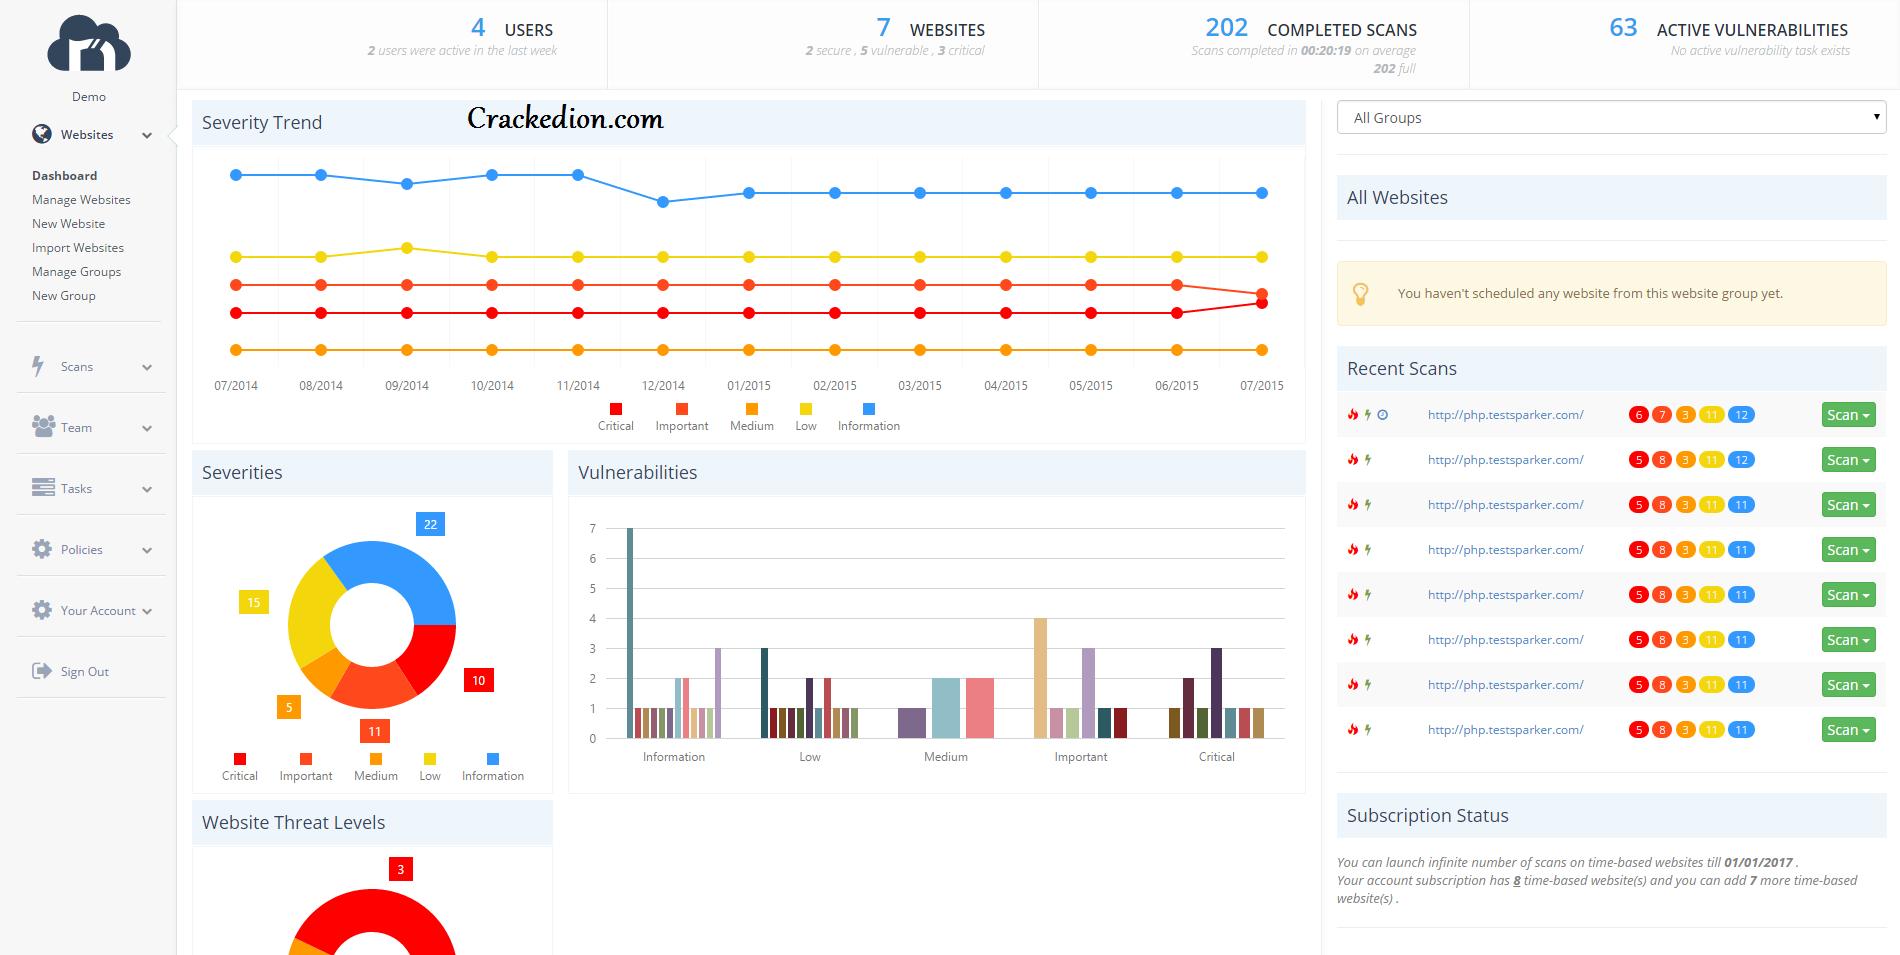 Netsparker Professional 5.3.0.23162 Latest Version Cracked 2020